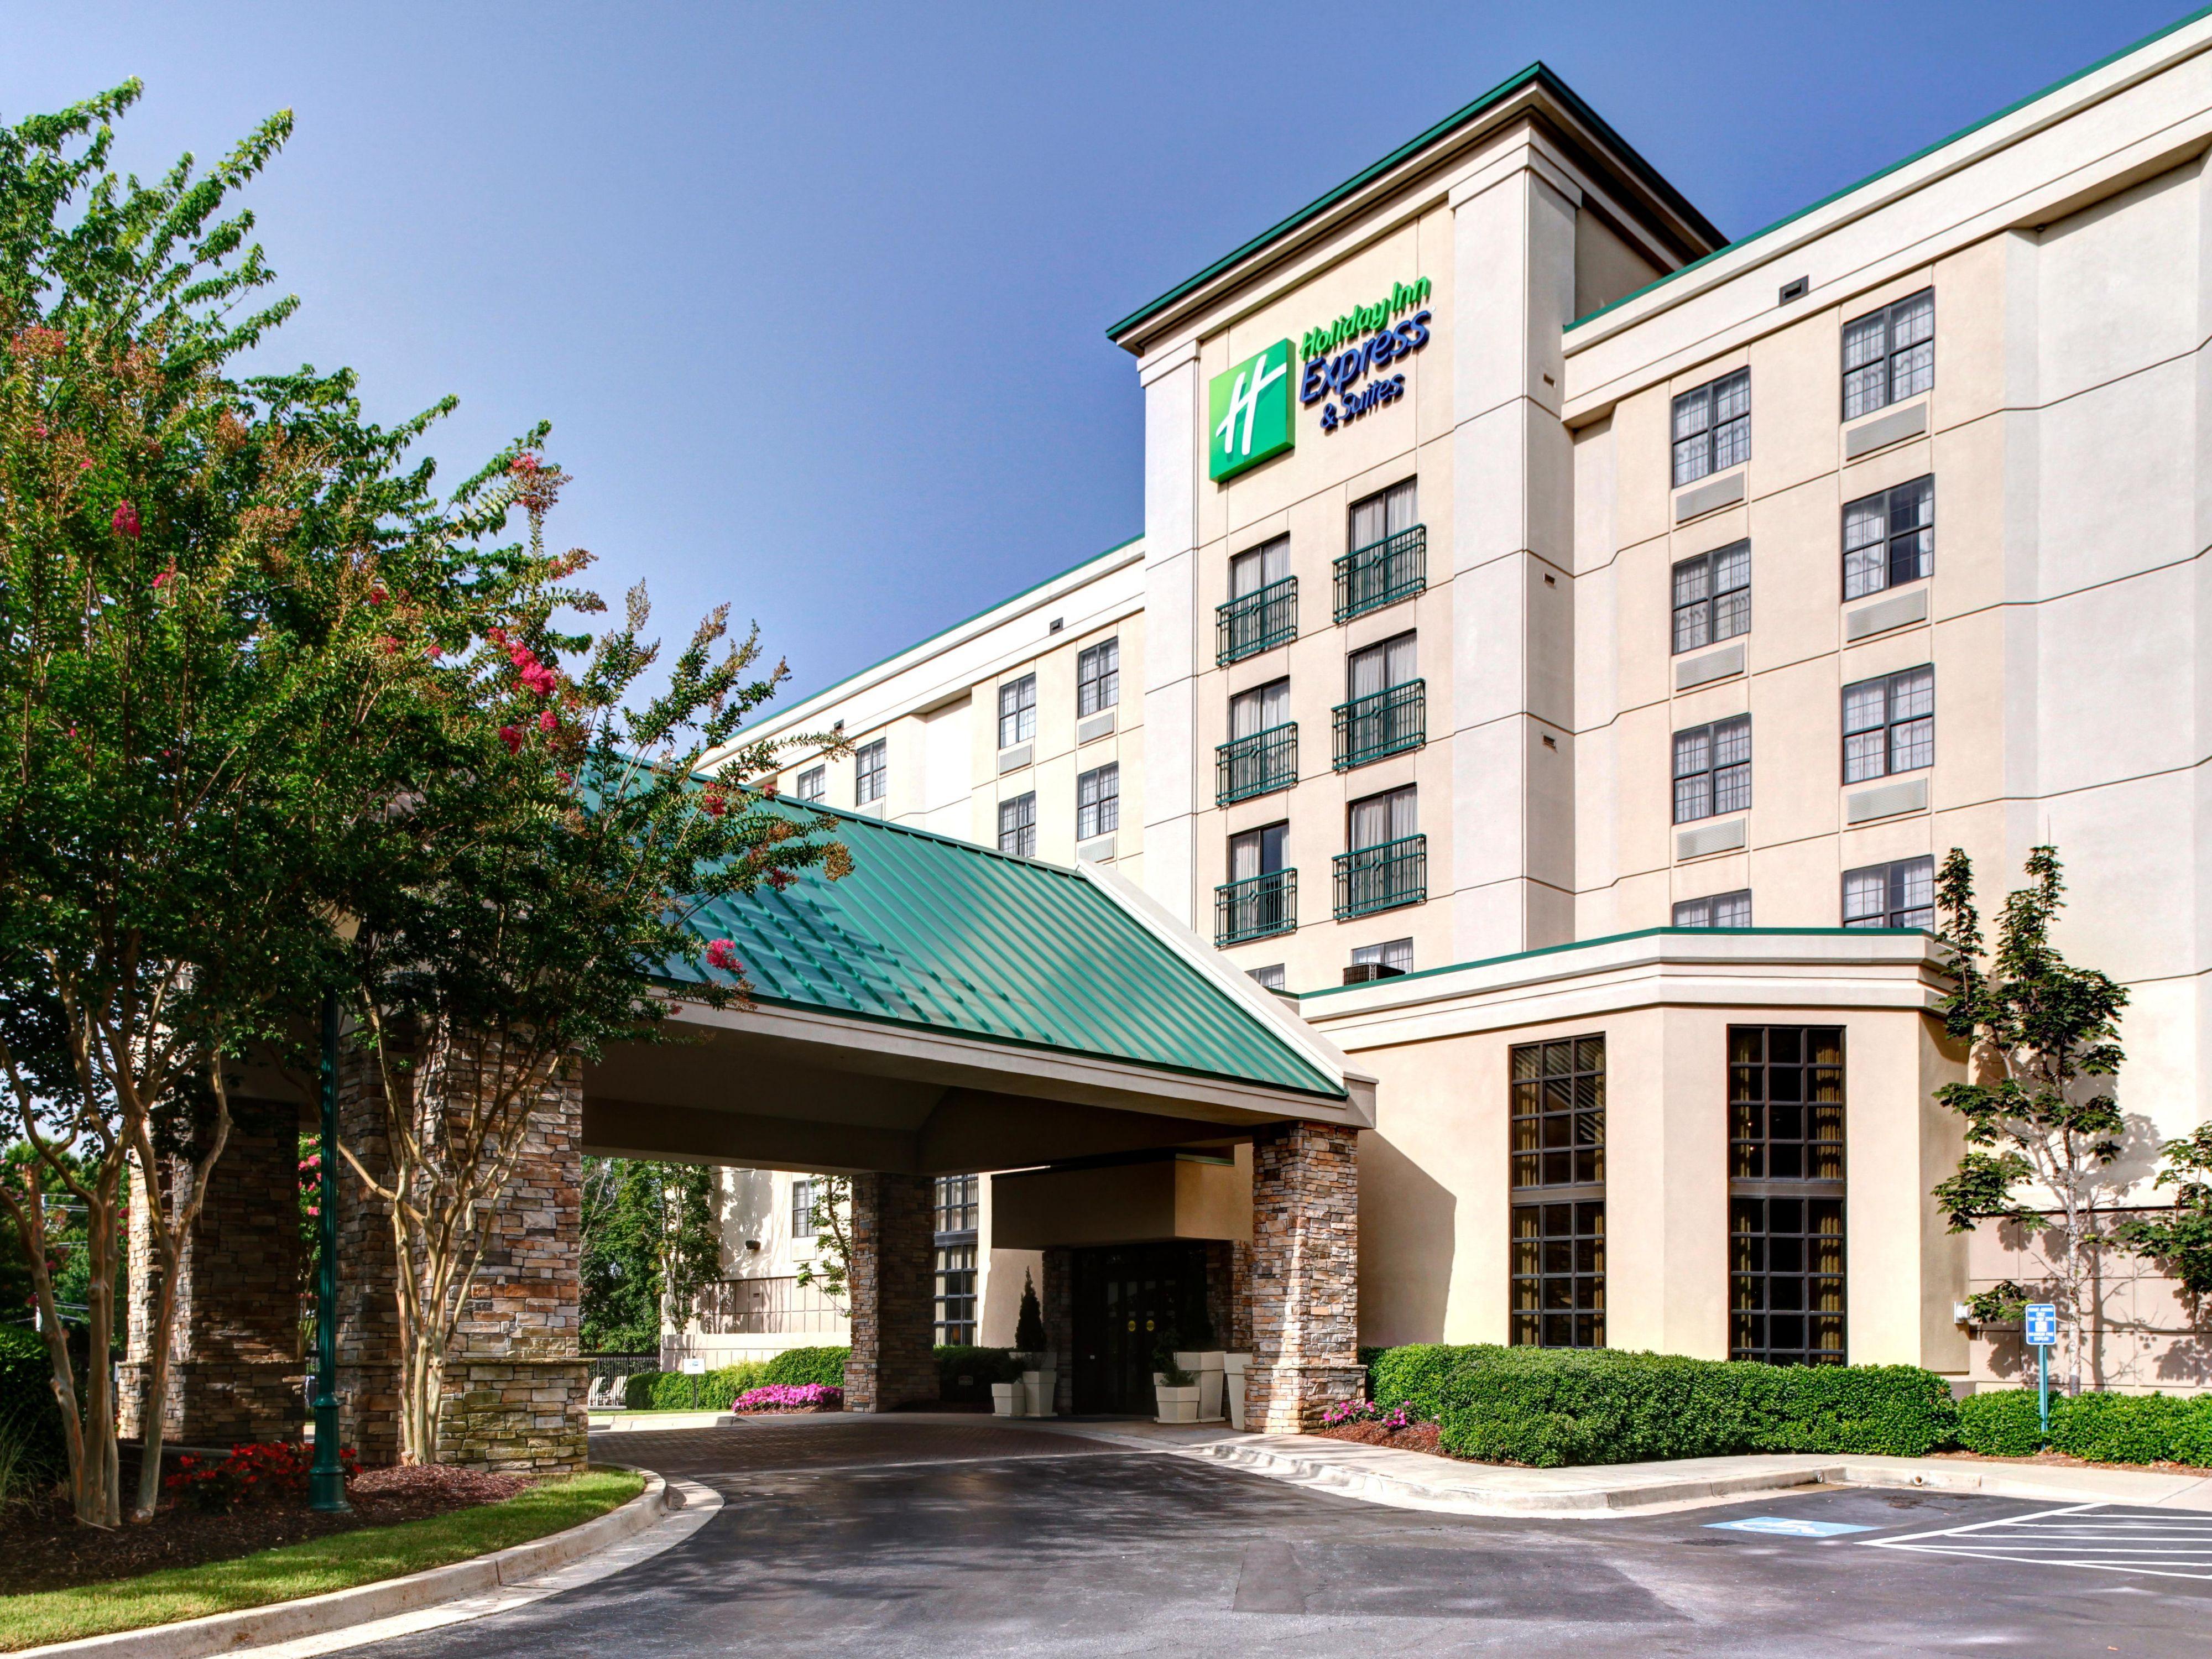 Holiday Inn Express Holiday Inn Express Suites Atlanta Buckhead